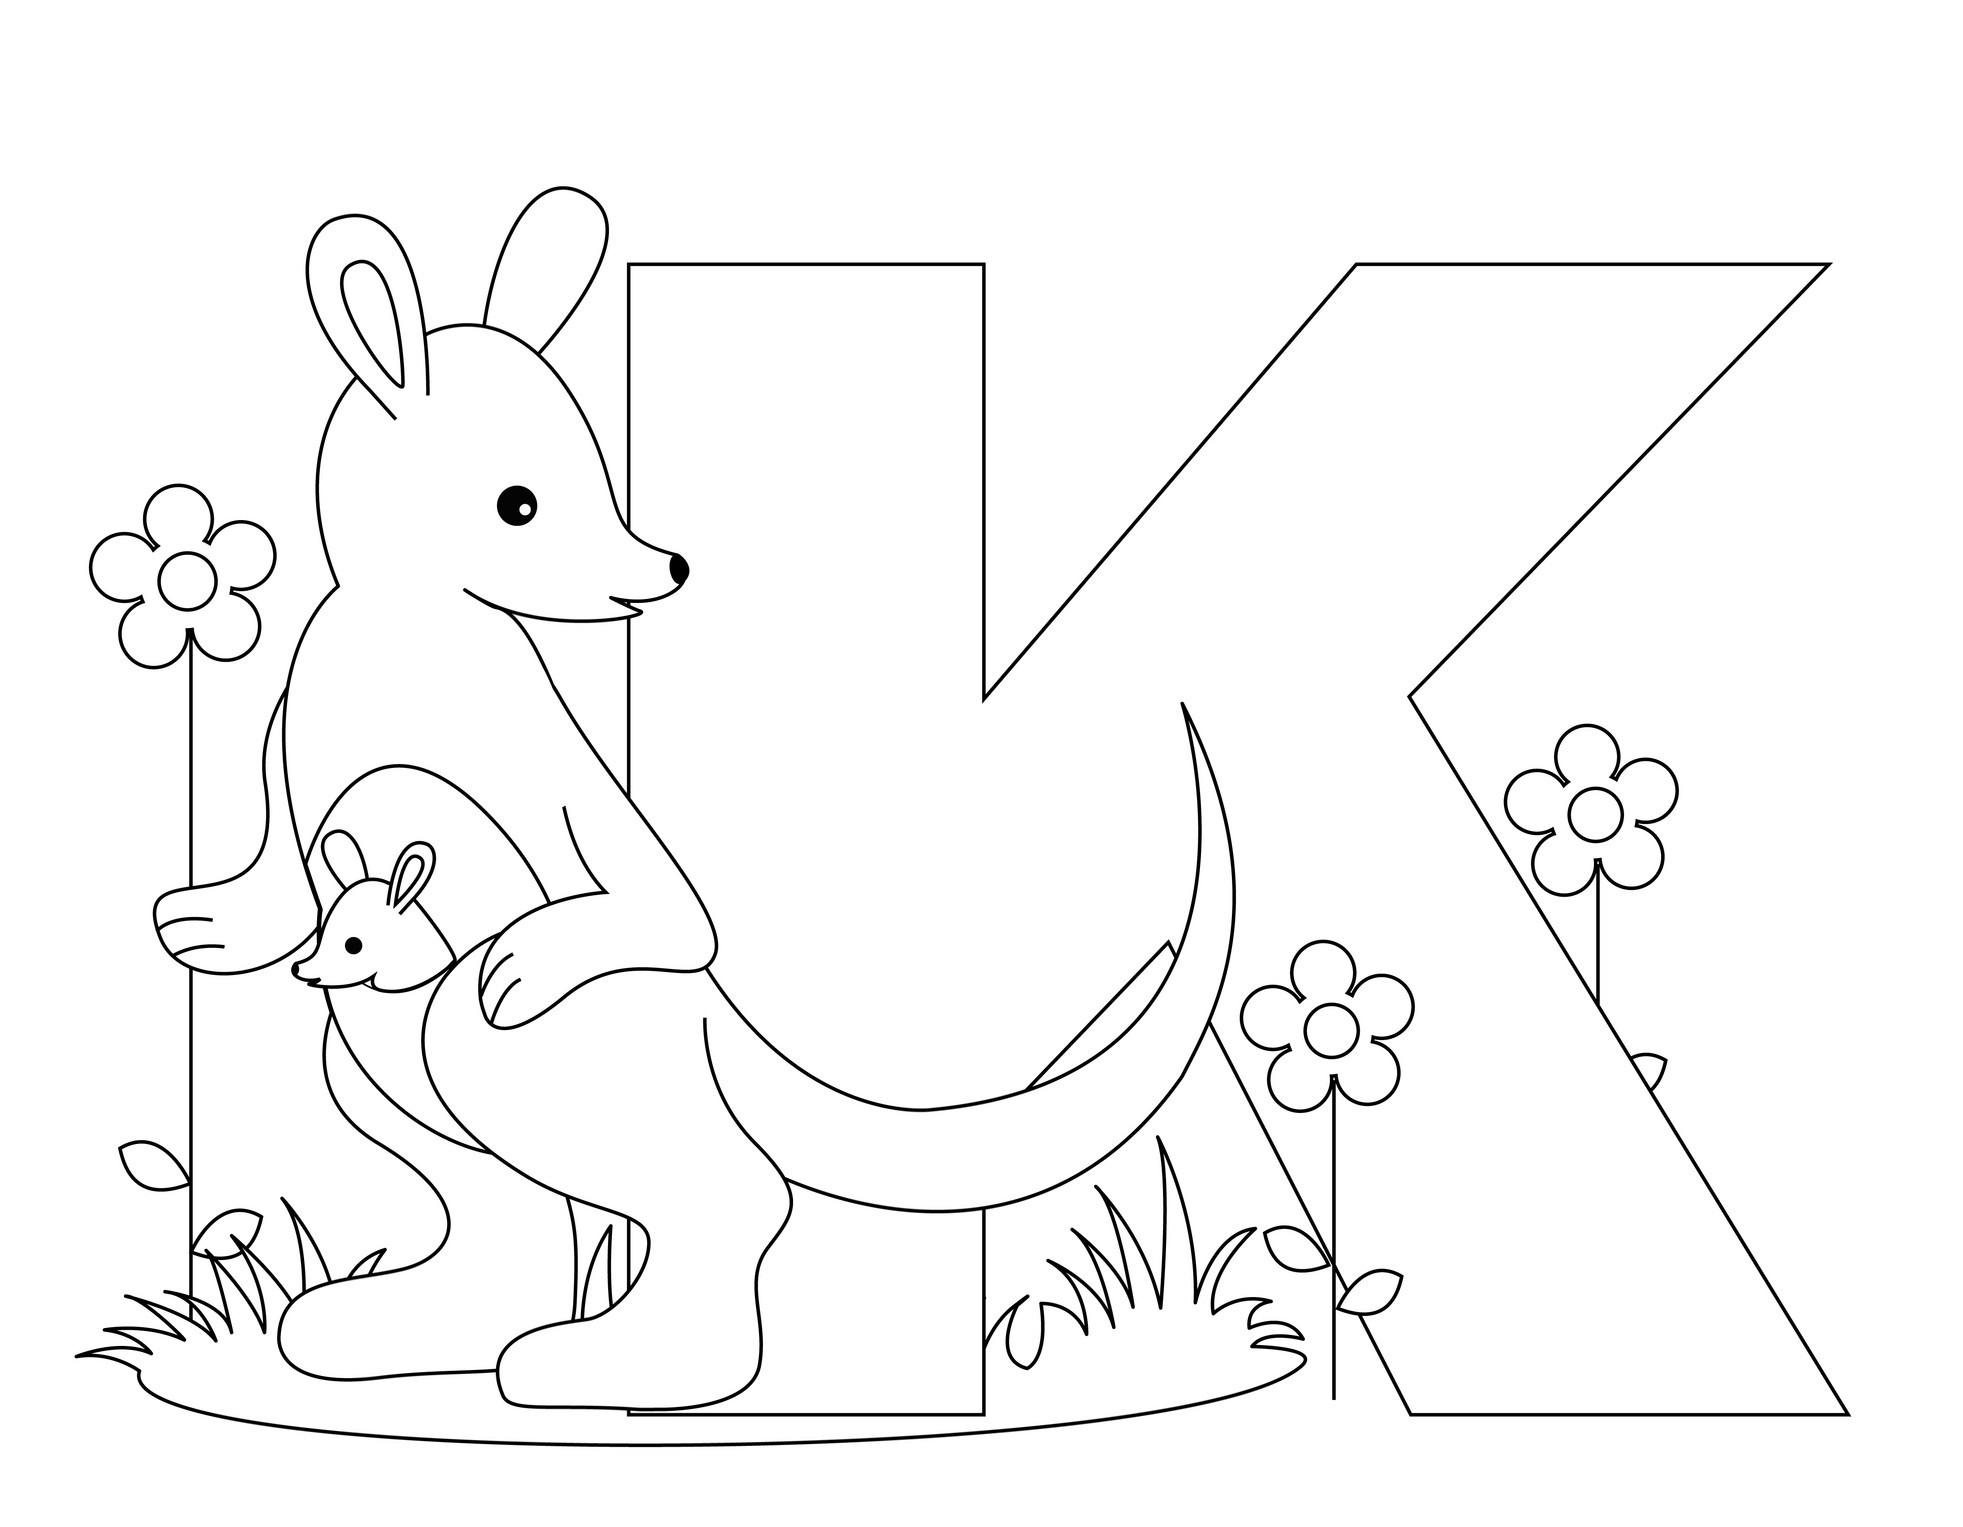 coloring pages alphabet free letter p alphabet coloring pages 3 free printable pages free alphabet coloring